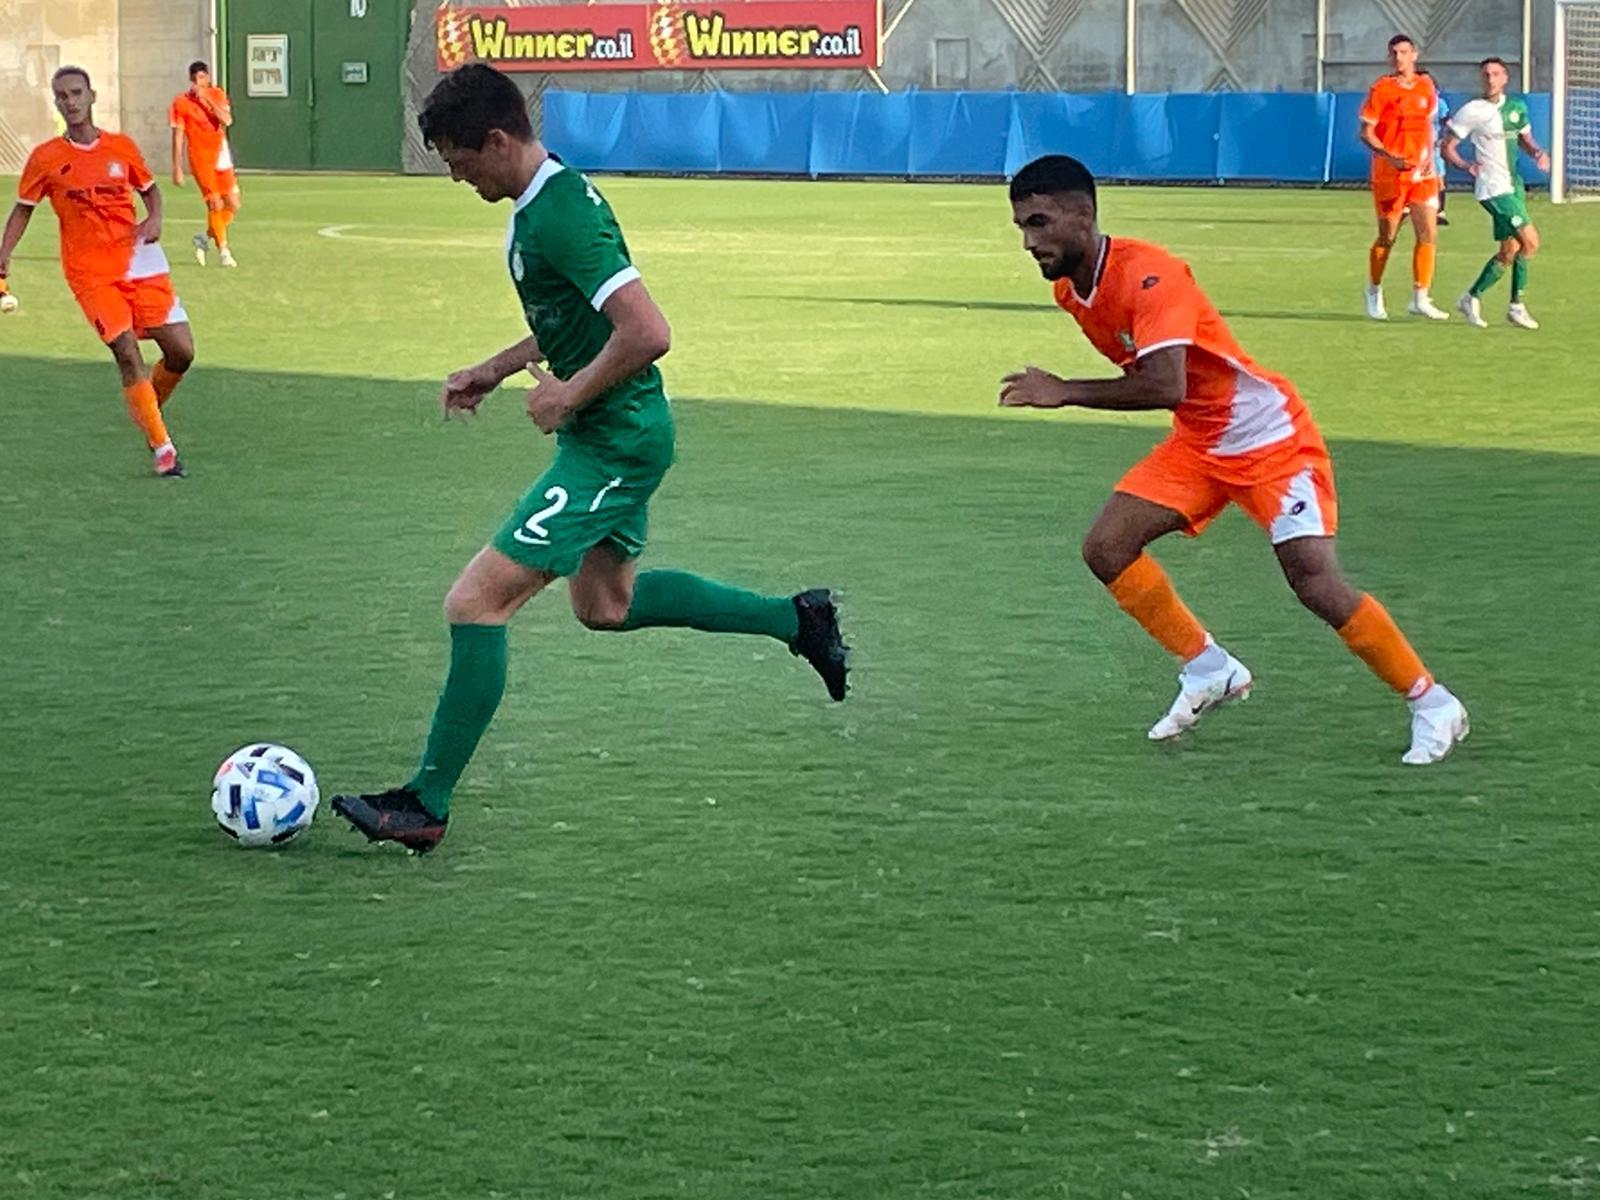 נוער: ניצחון 0:1 בנס ציונה